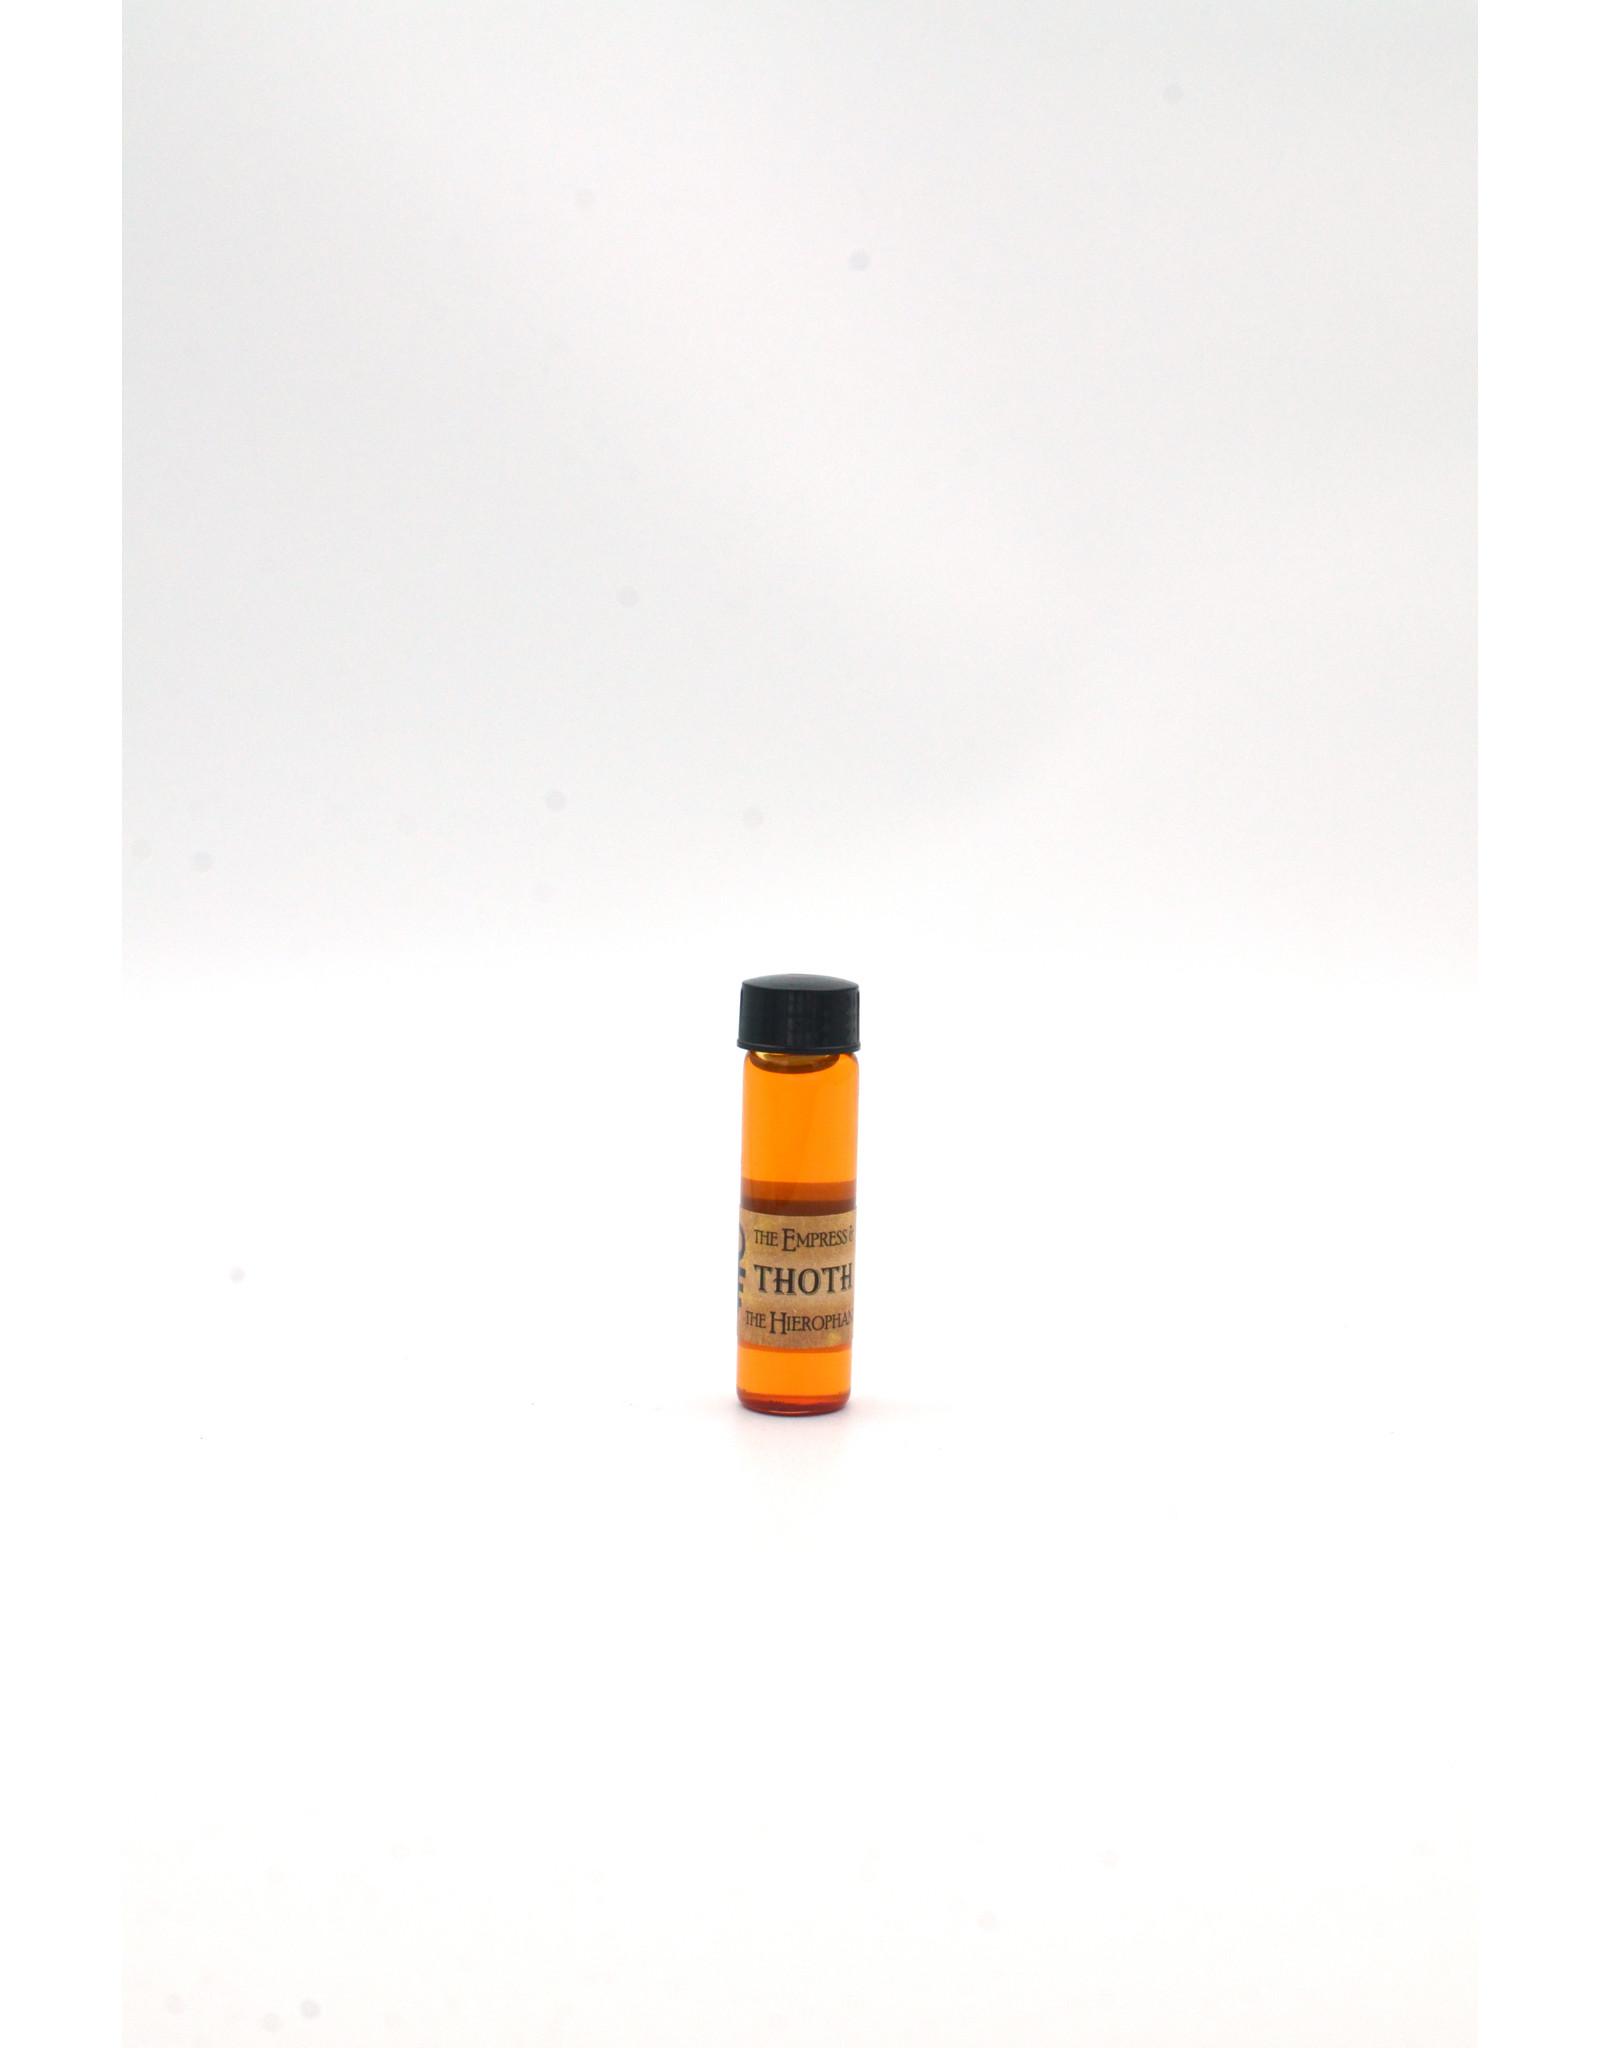 Thoth Magickal Oil 1 Dram Bottle